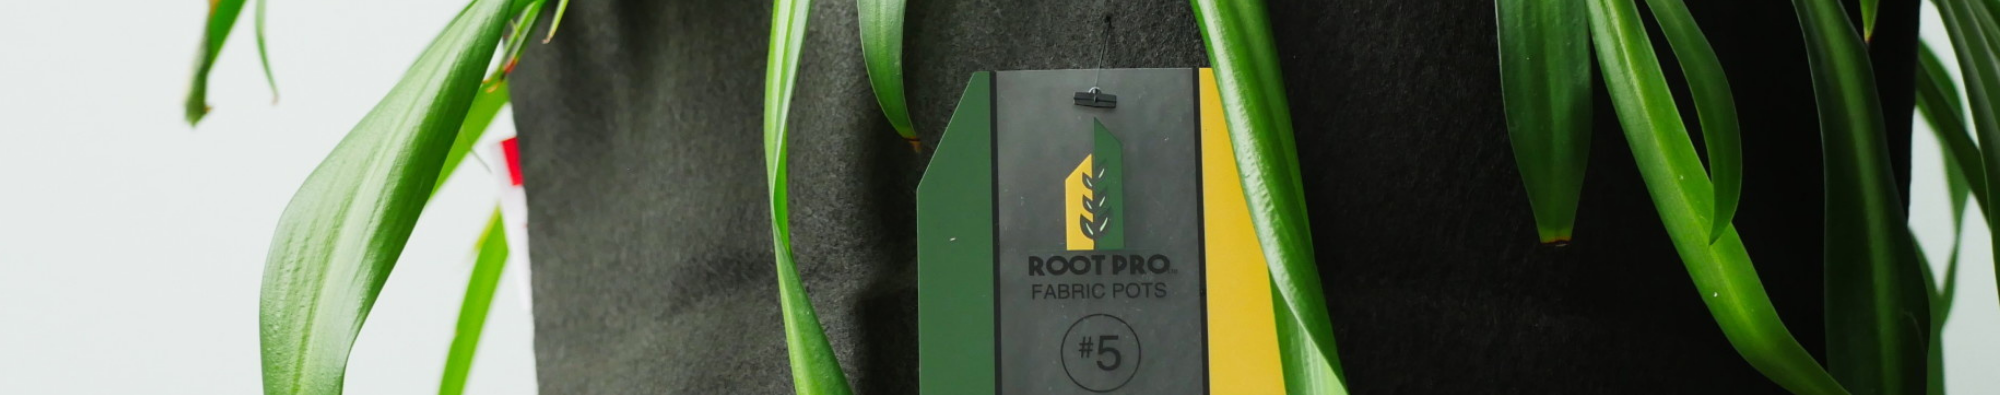 RootPro